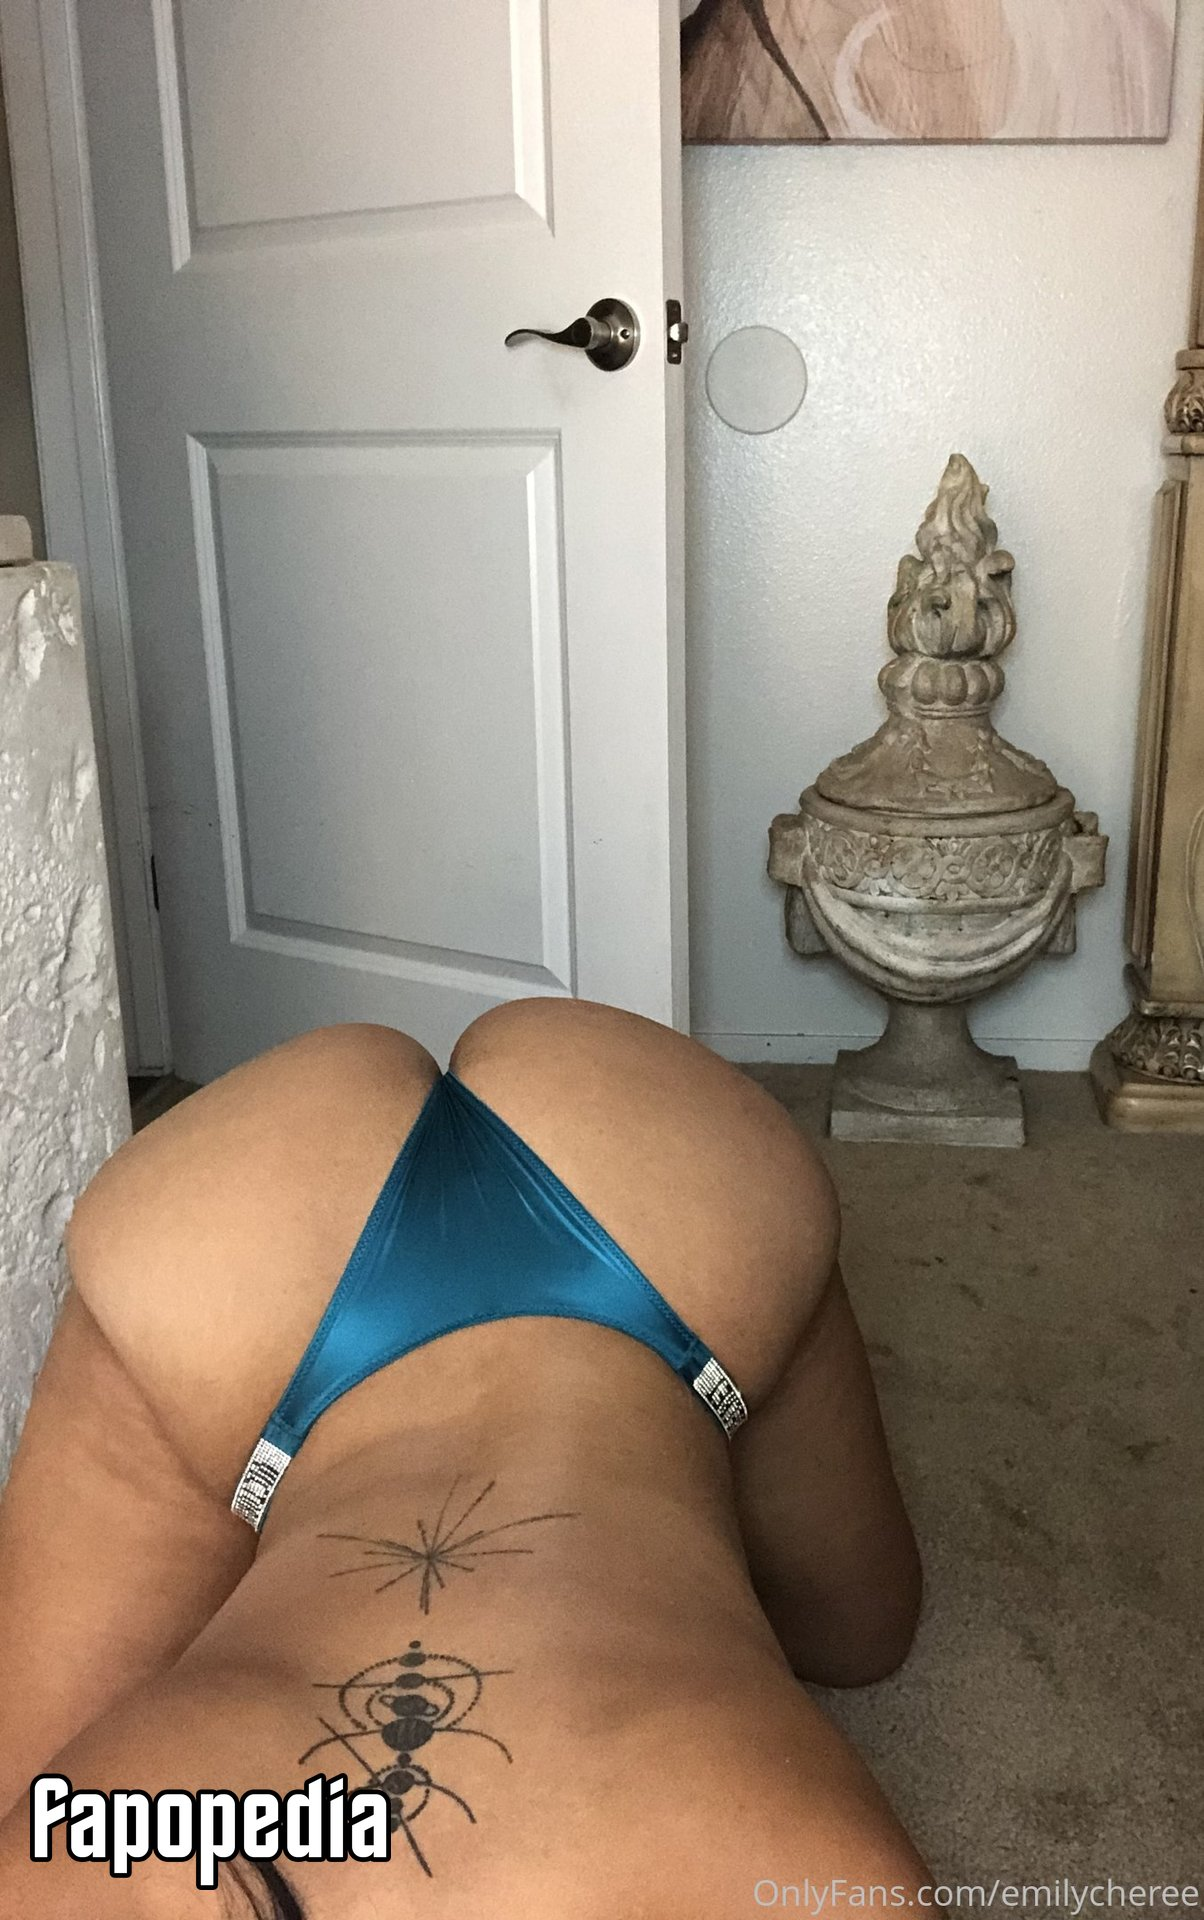 Emily Cheree Nude OnlyFans Leaks Patreon Leaks